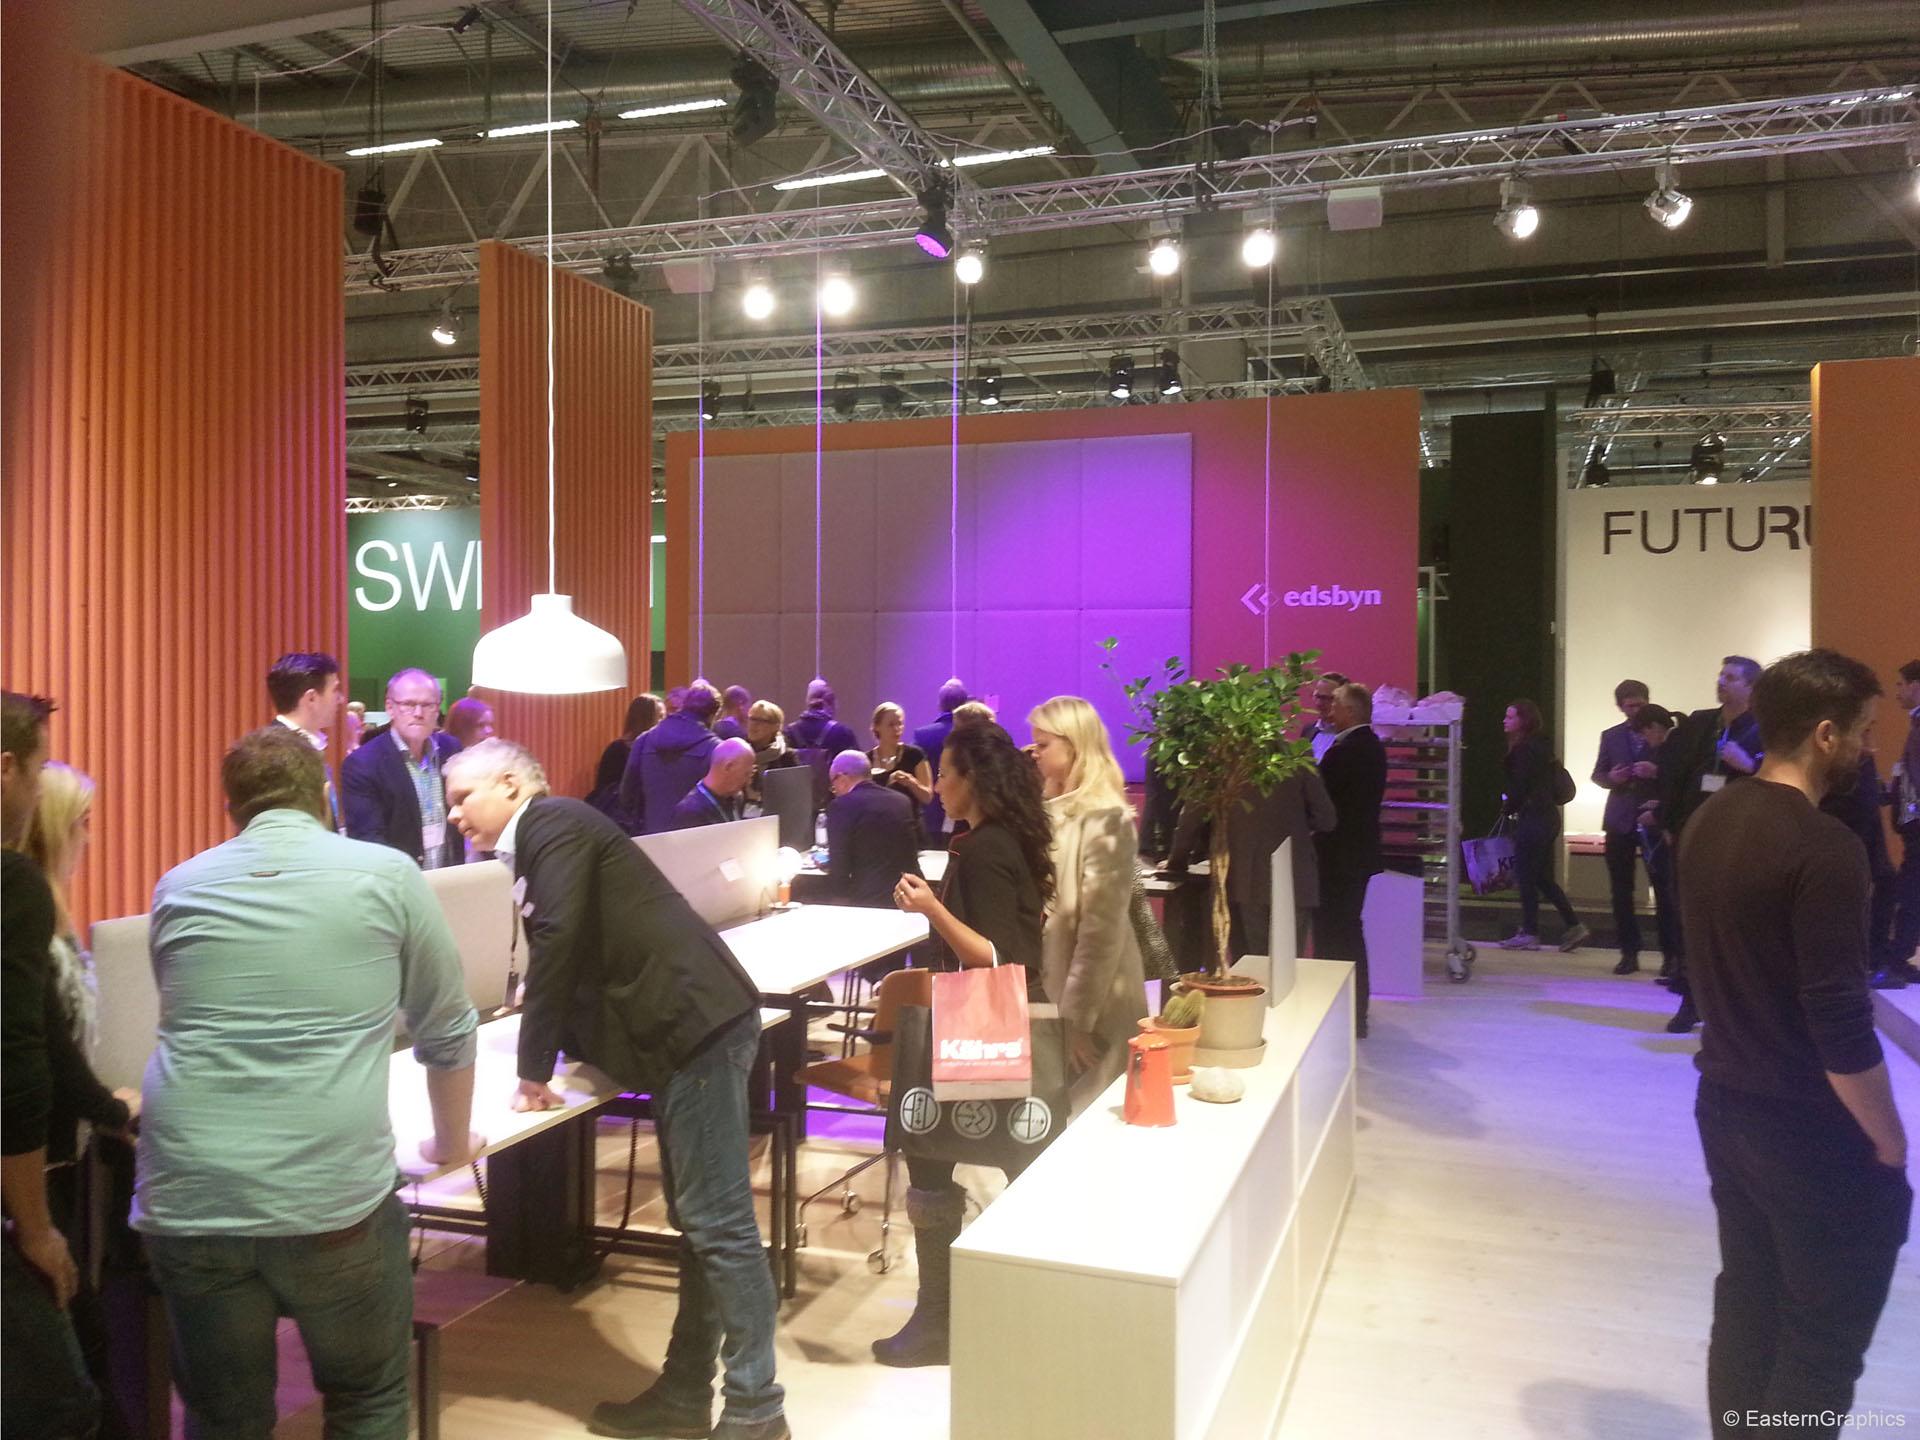 Impressions from Stockholm Furniture & Light Fair 2015 - Edsbyn